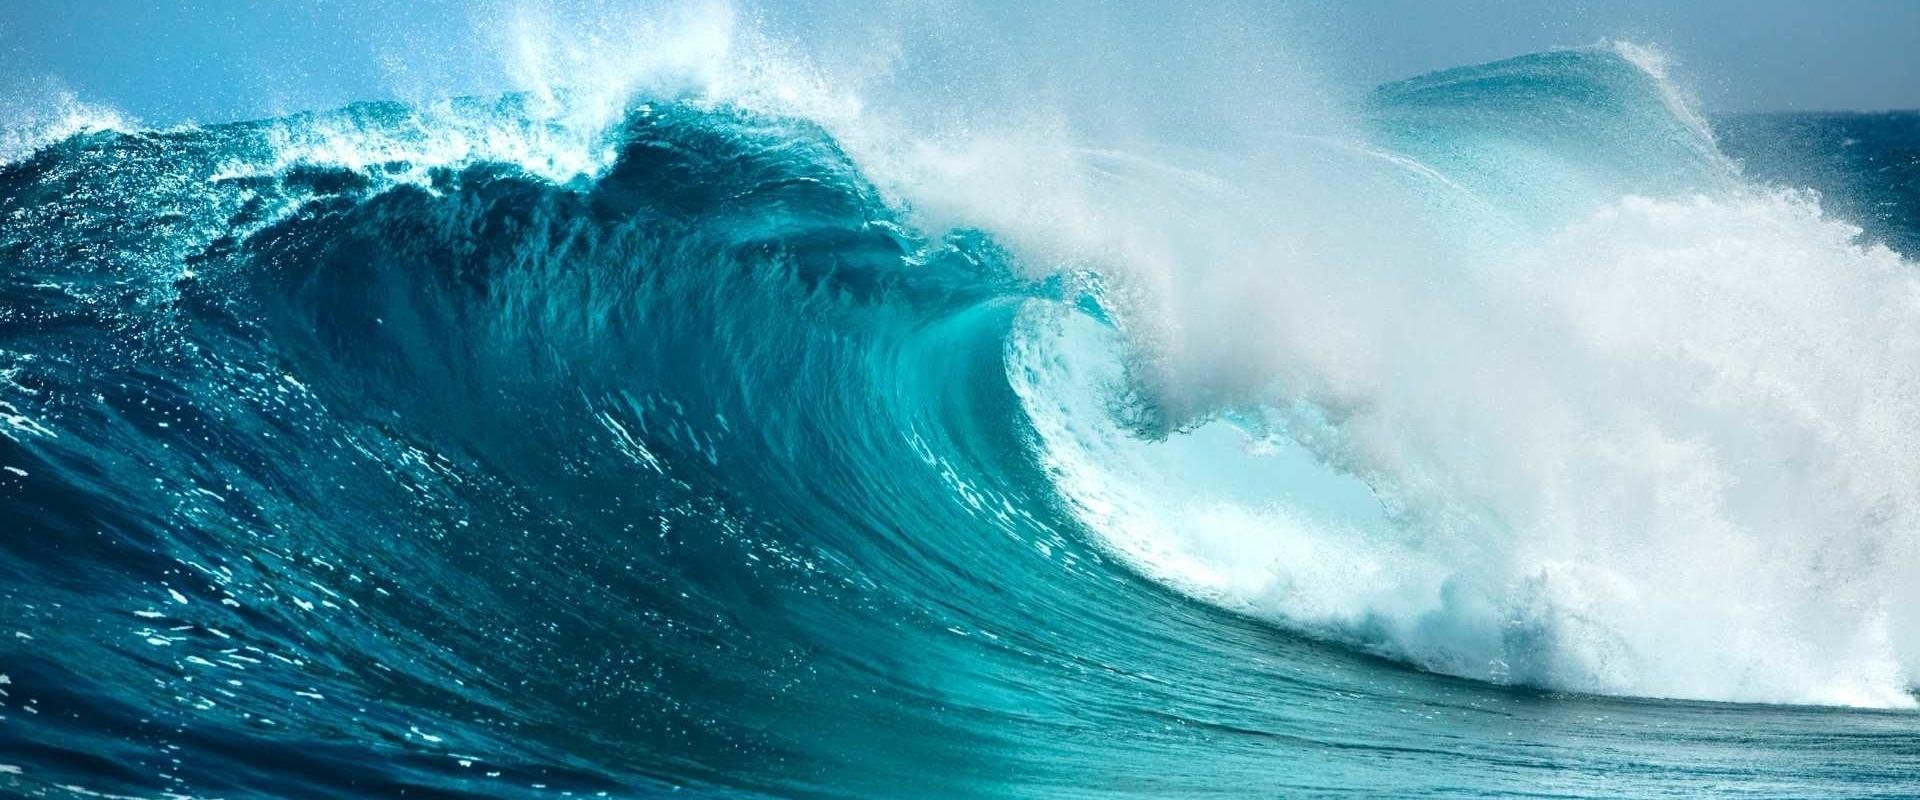 MBRC armbanden; Save the ocean armband